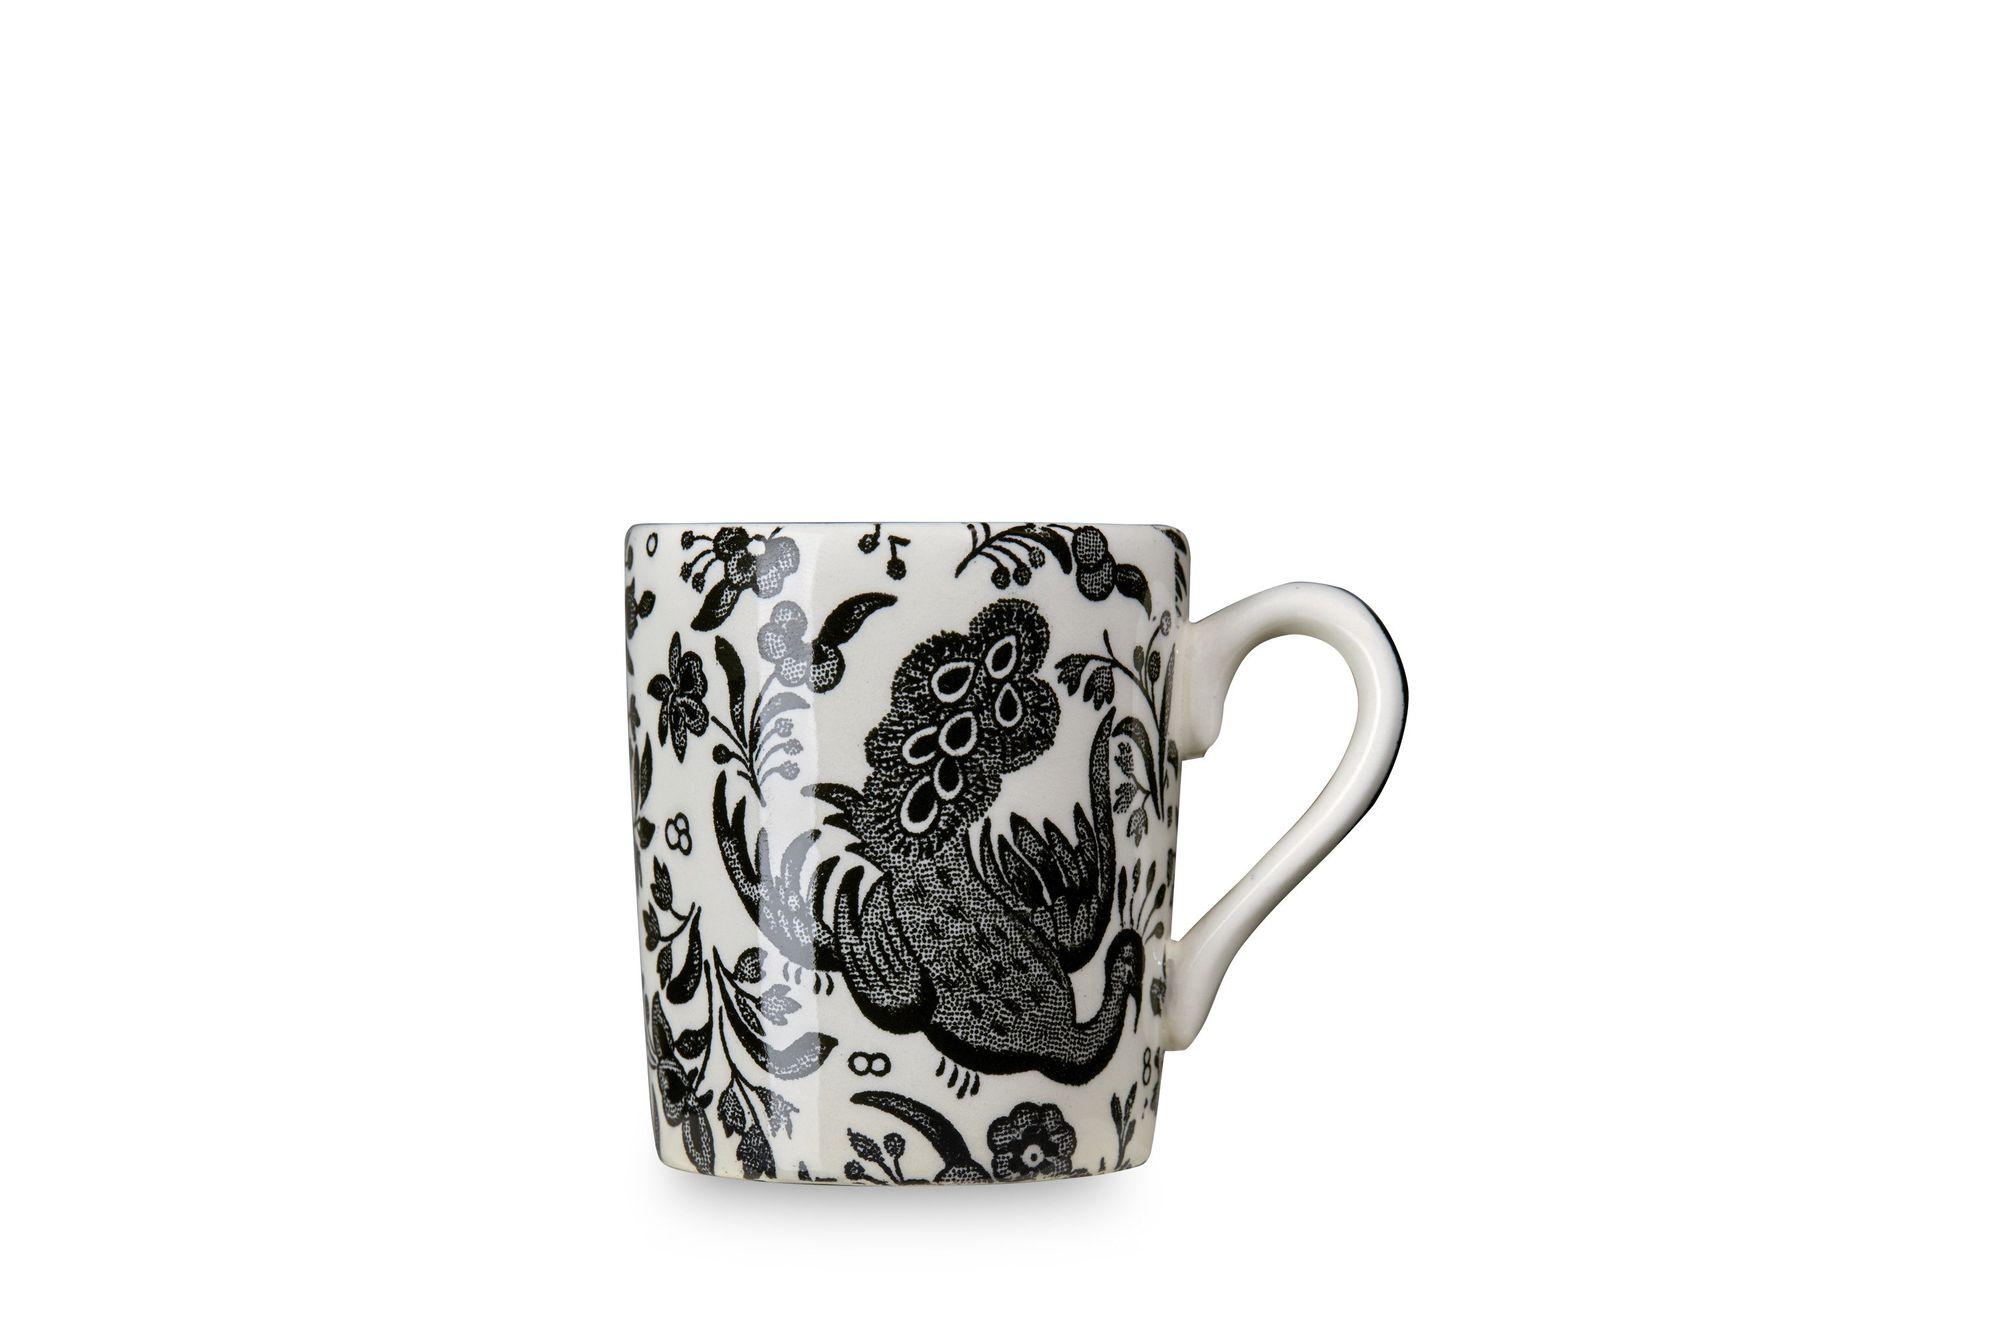 Burleigh Black Regal Peacock Espresso Cup thumb 1